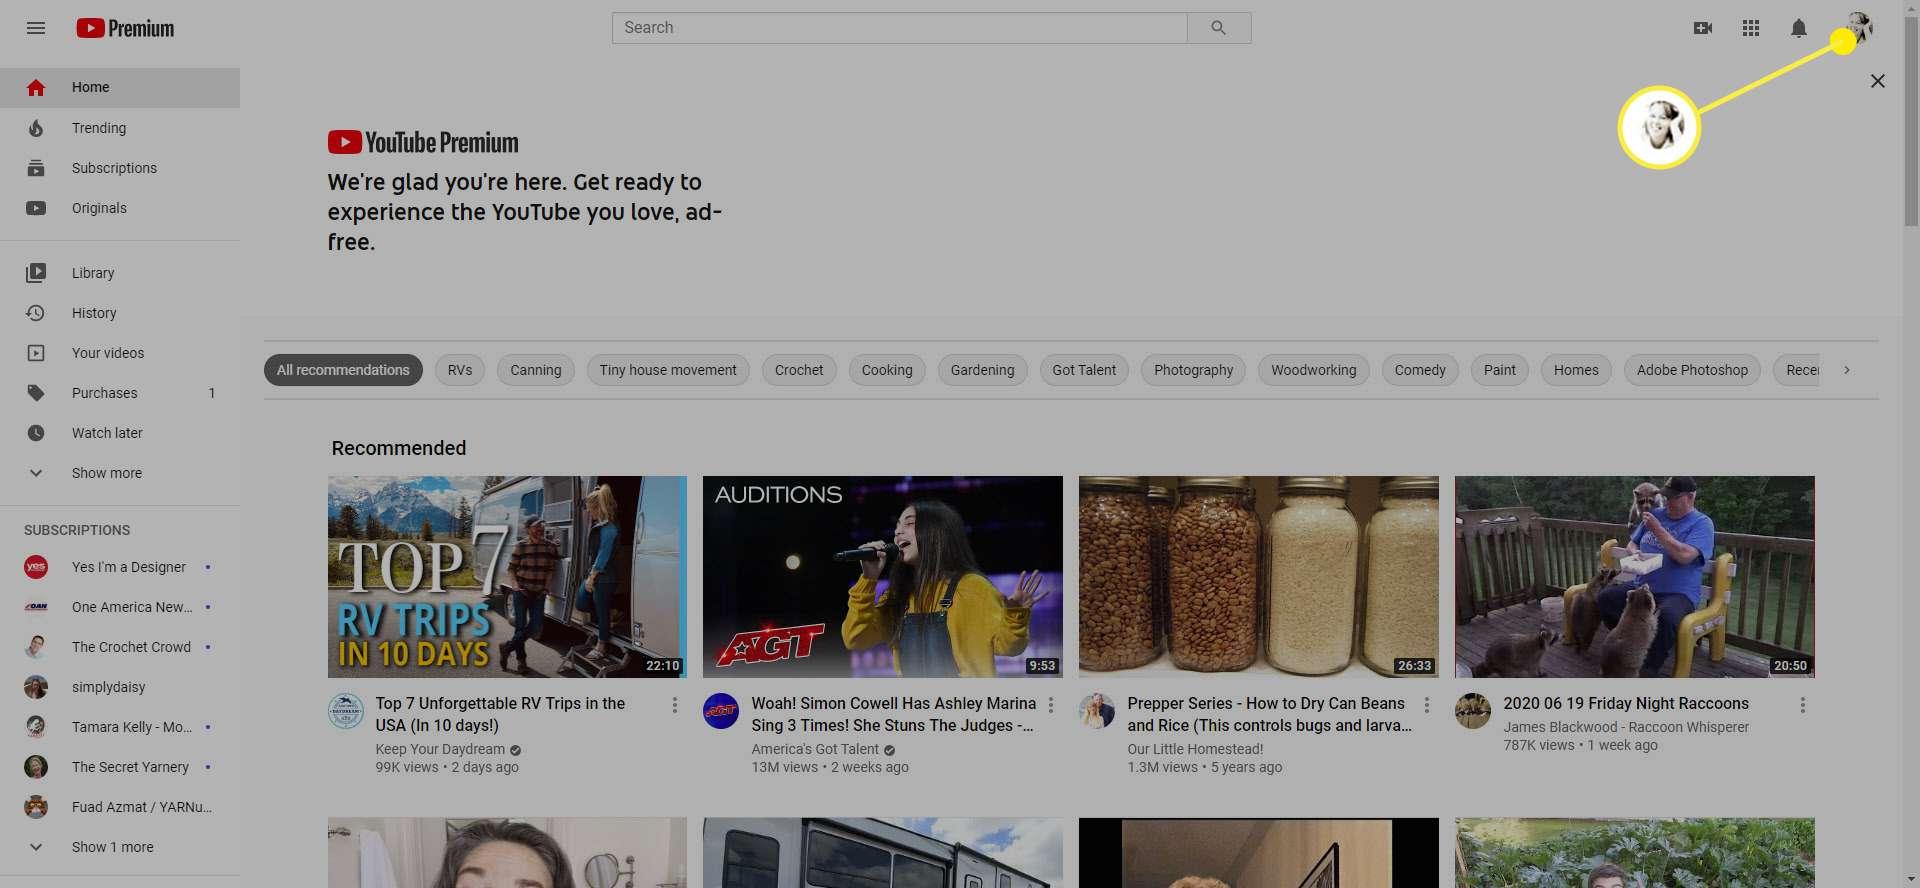 The Profile option in YouTube Premium.